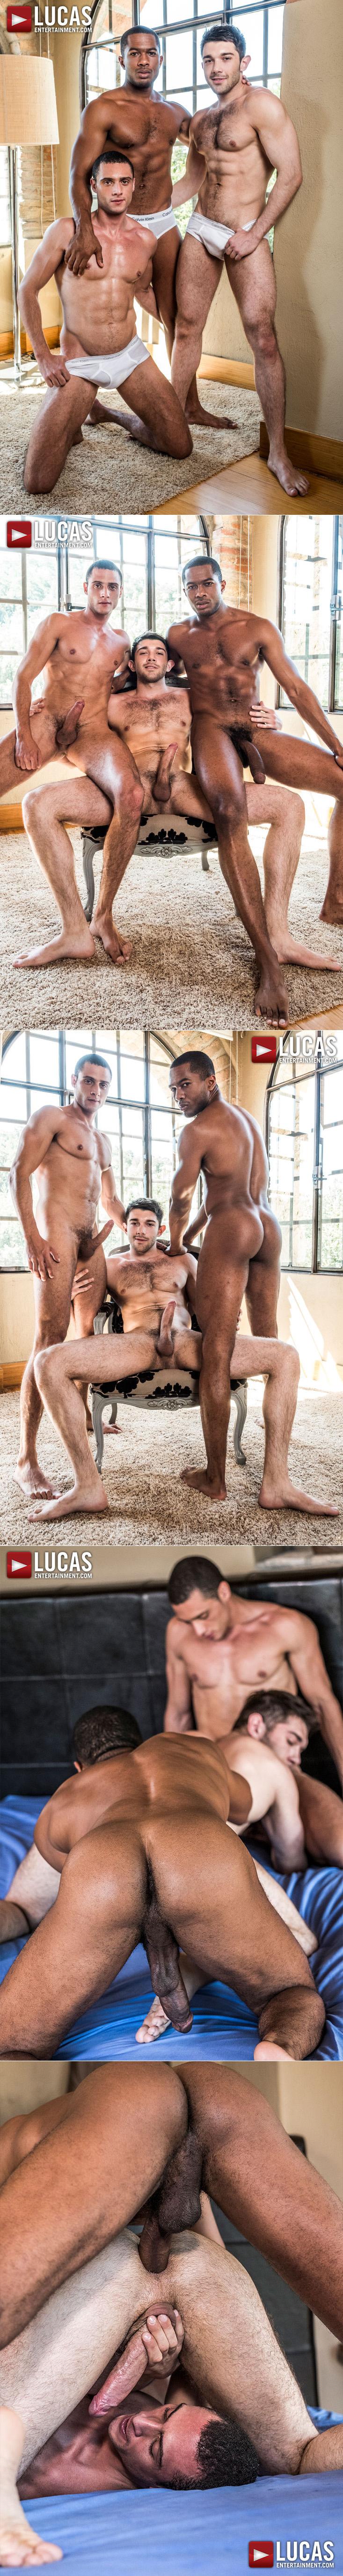 LucasEntertainment Sean Xavier Javi Velaro Ben Batemen Threesome Gay Bareback Sex Double Penetration Fuck Train Interracial Porn Uncut Cock Hairy Chest Male Feet 1